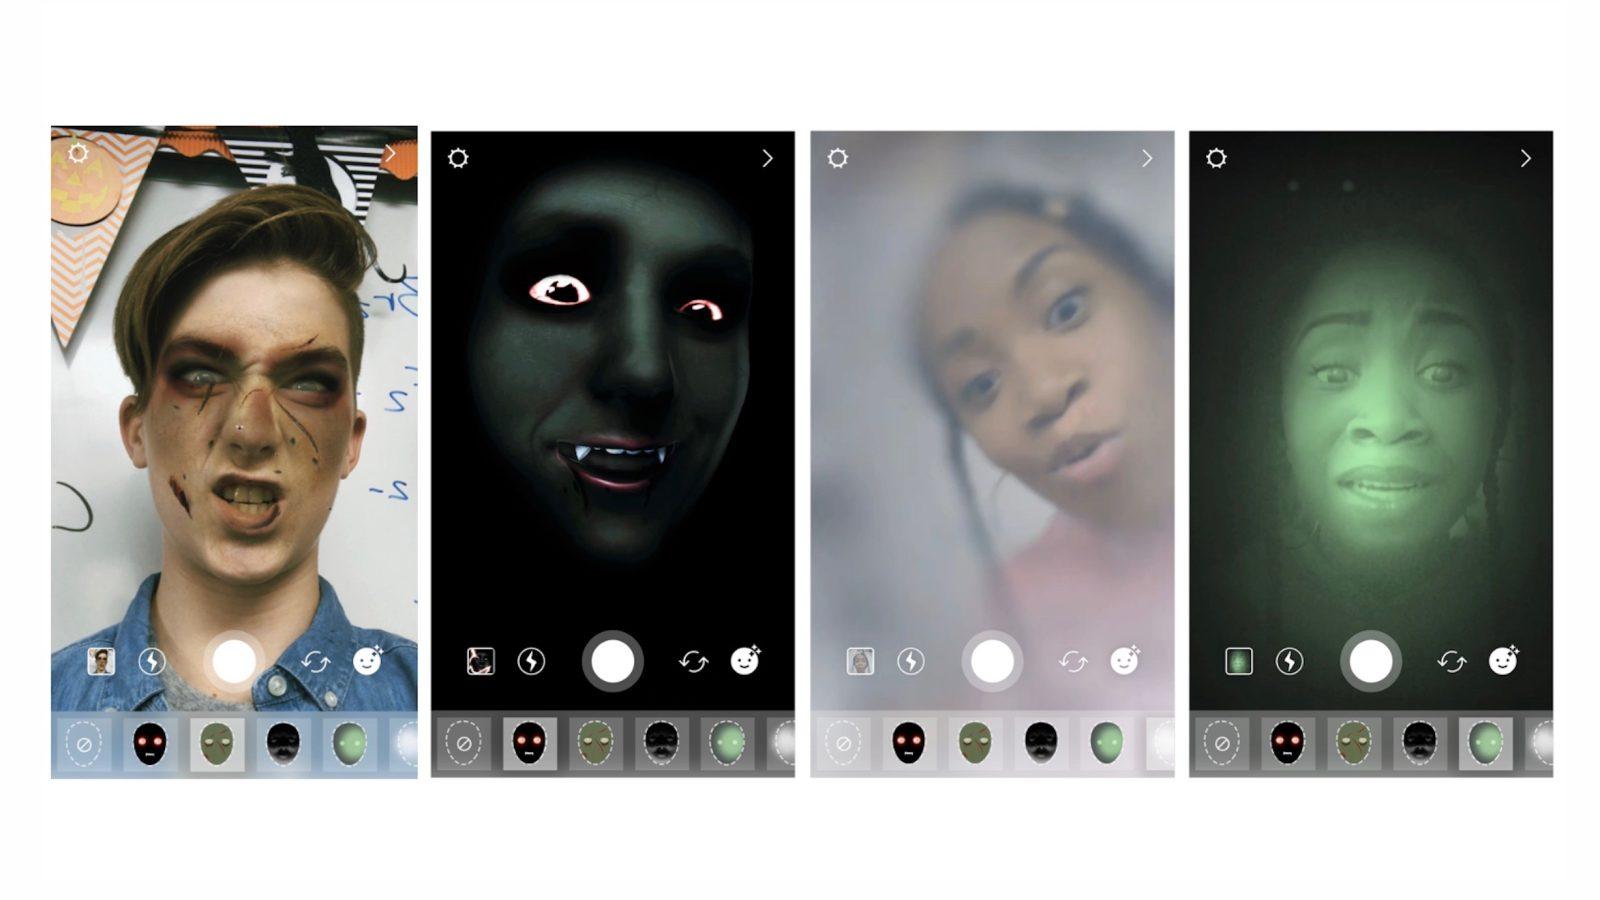 Fitur Terbaru Instagram Superzoom, Filter dan Stiker Halloween